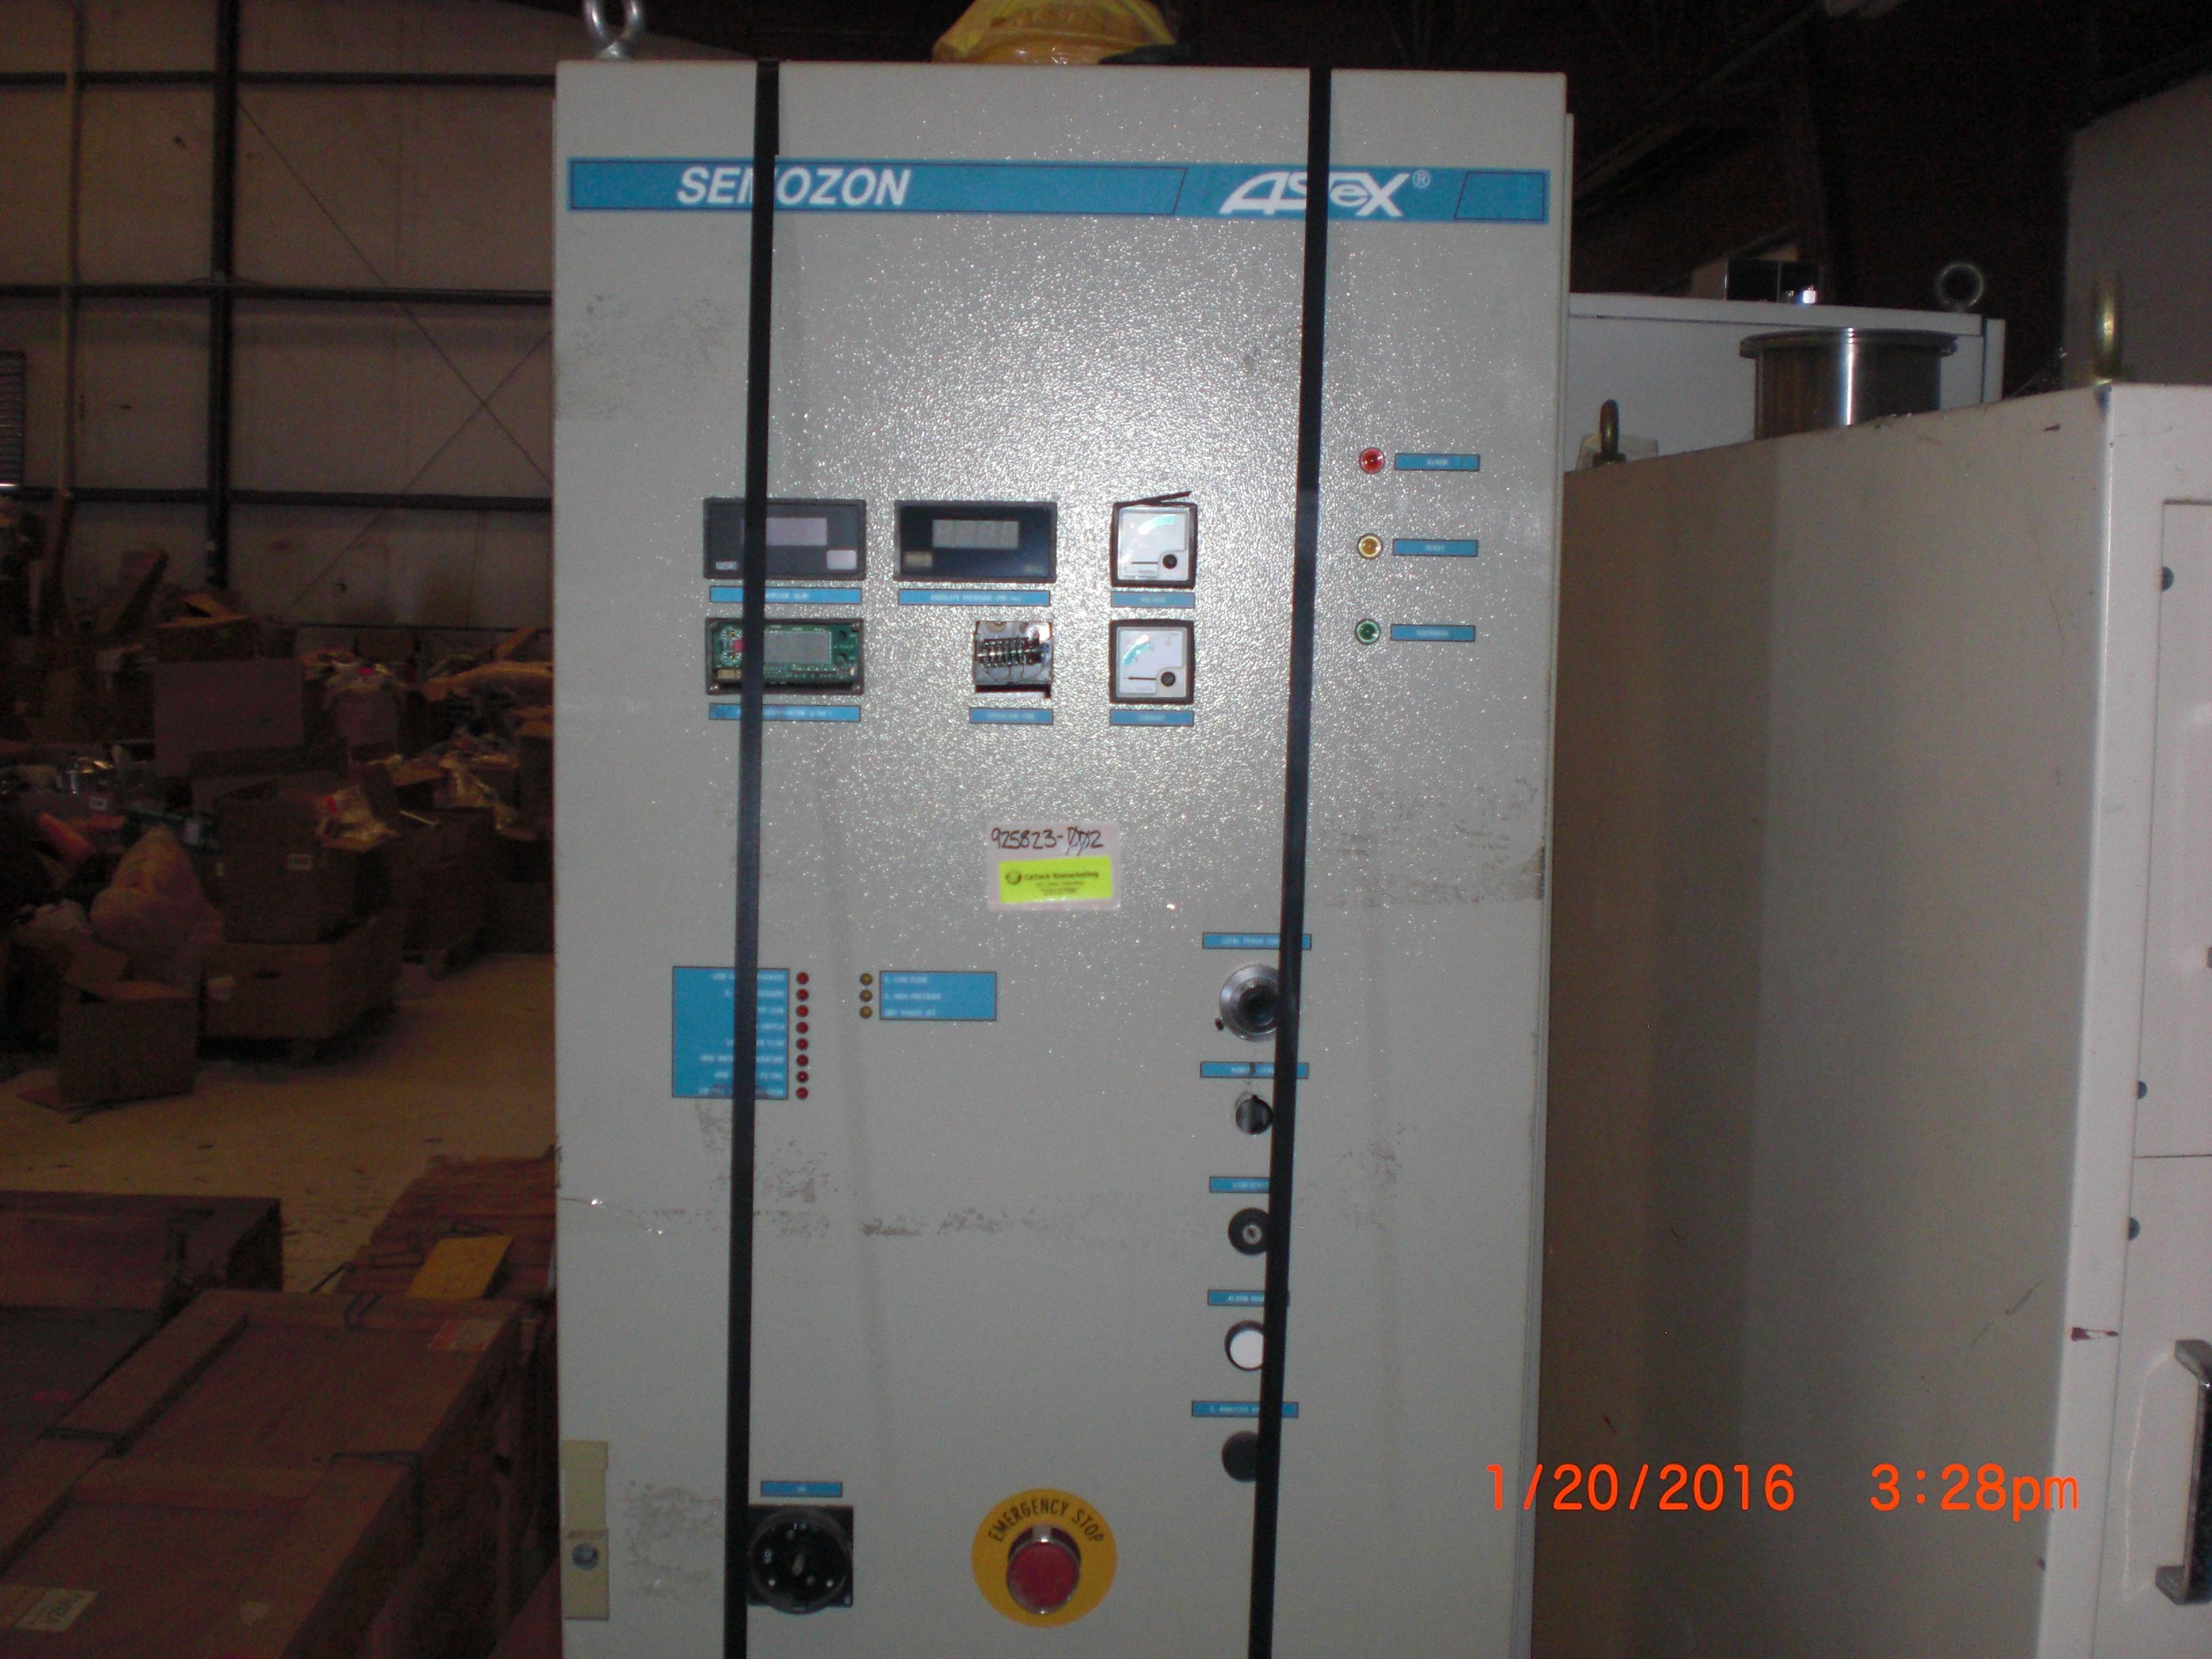 Generator OZONE ASTEX 250.3 Semoze configured for Watkins Johnson